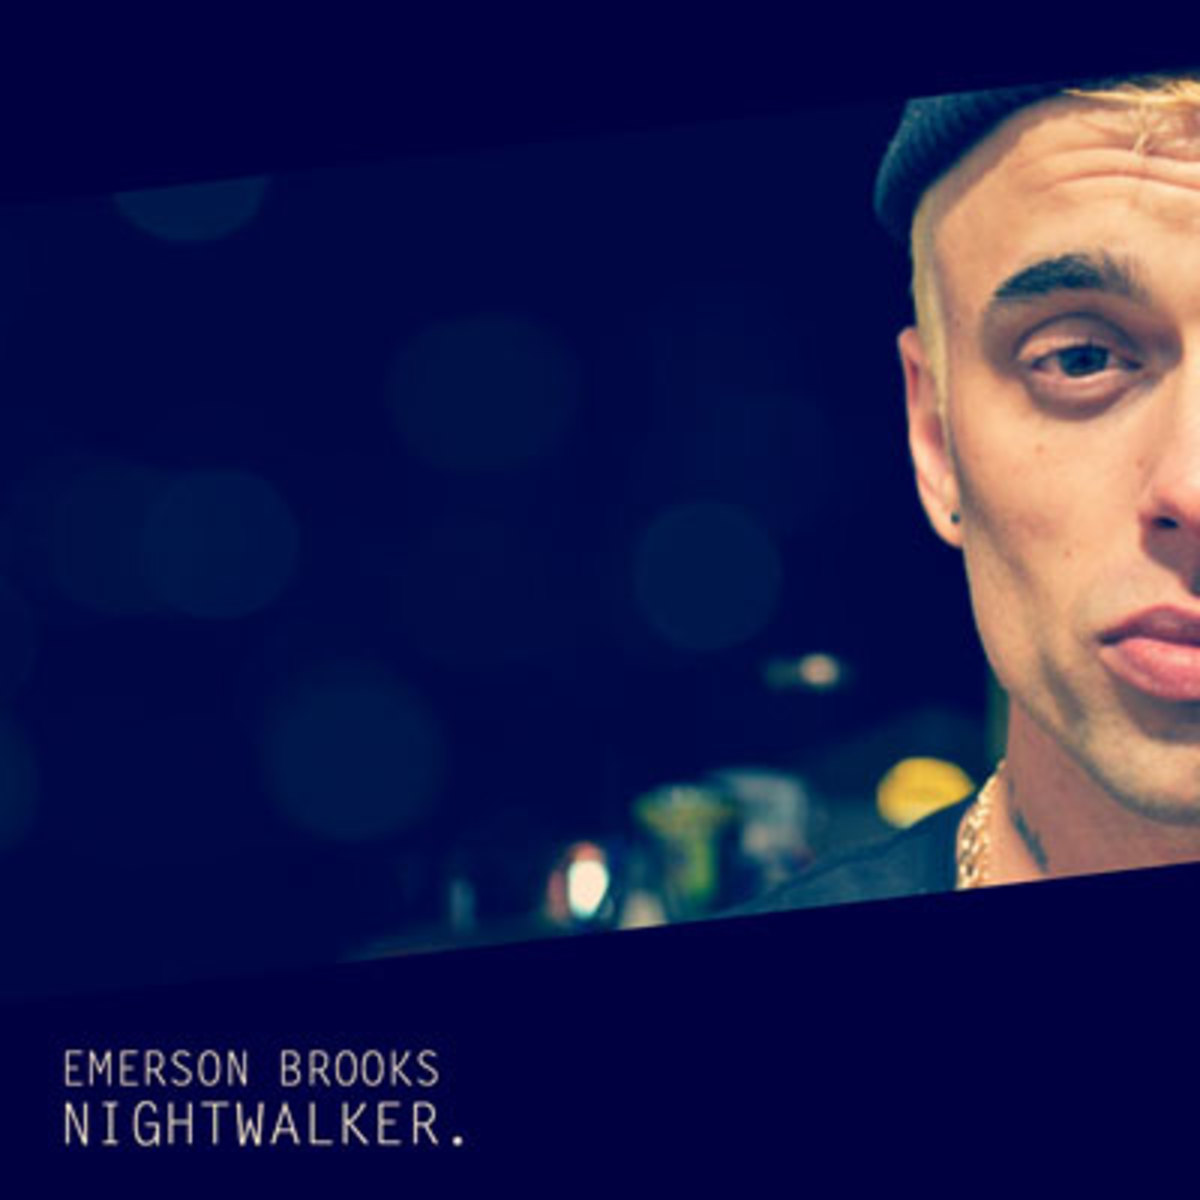 emersonbrooks-nightwalker.jpg